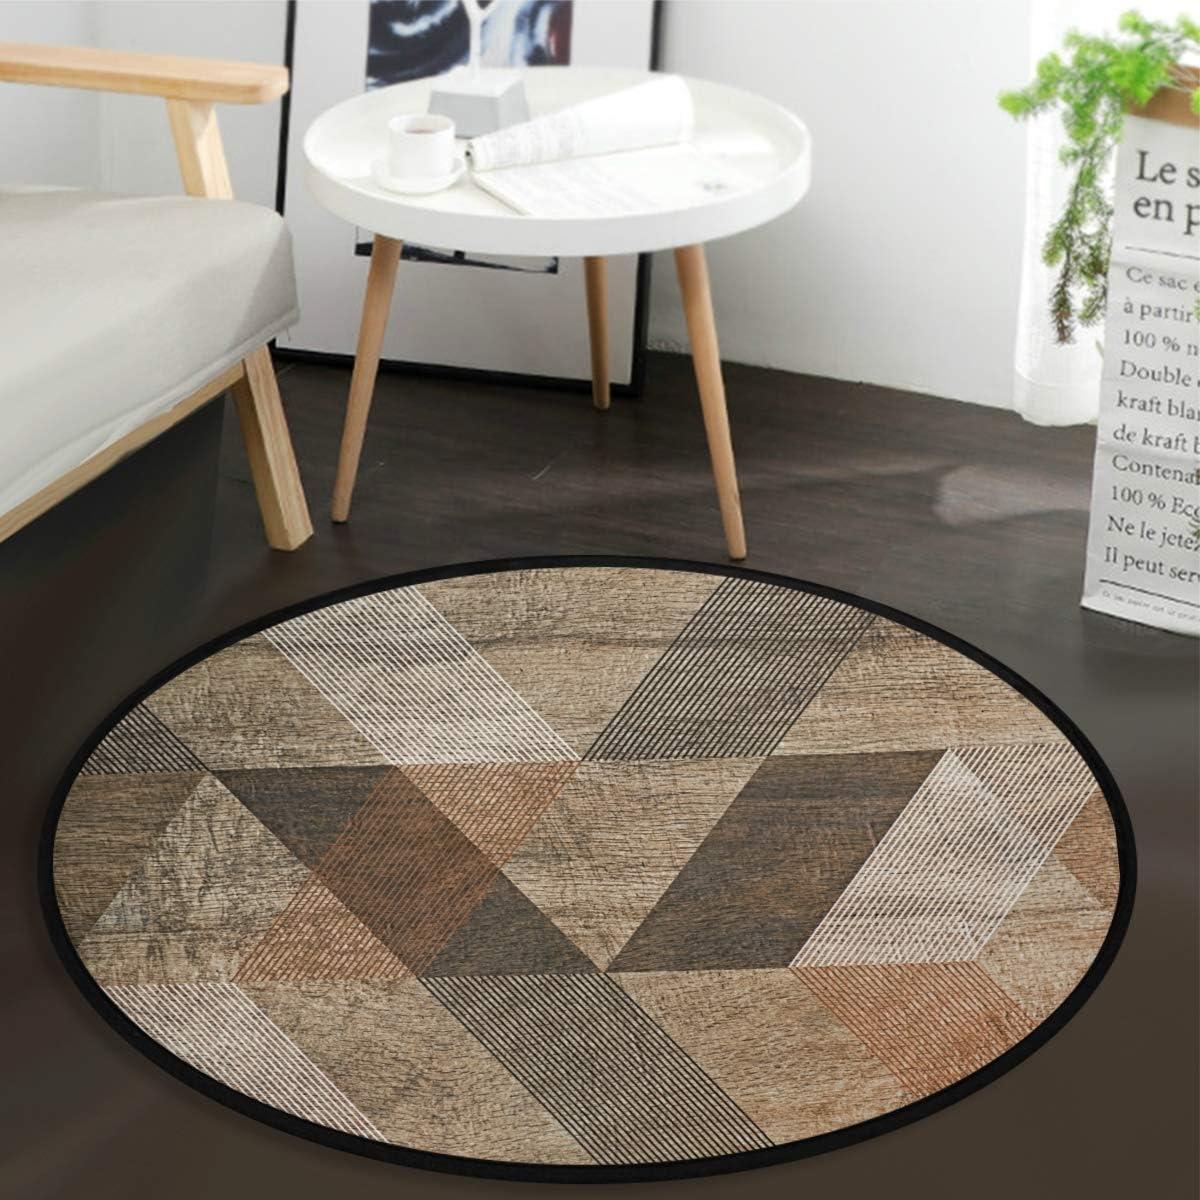 "Winter Snowflake Red Sparkle Doormat Round Floor Mat, Washable Non-Slip Indoor Outdoor Area Rug for Bedroom Living Room Home Decor 36"" (Triangle Brown)"